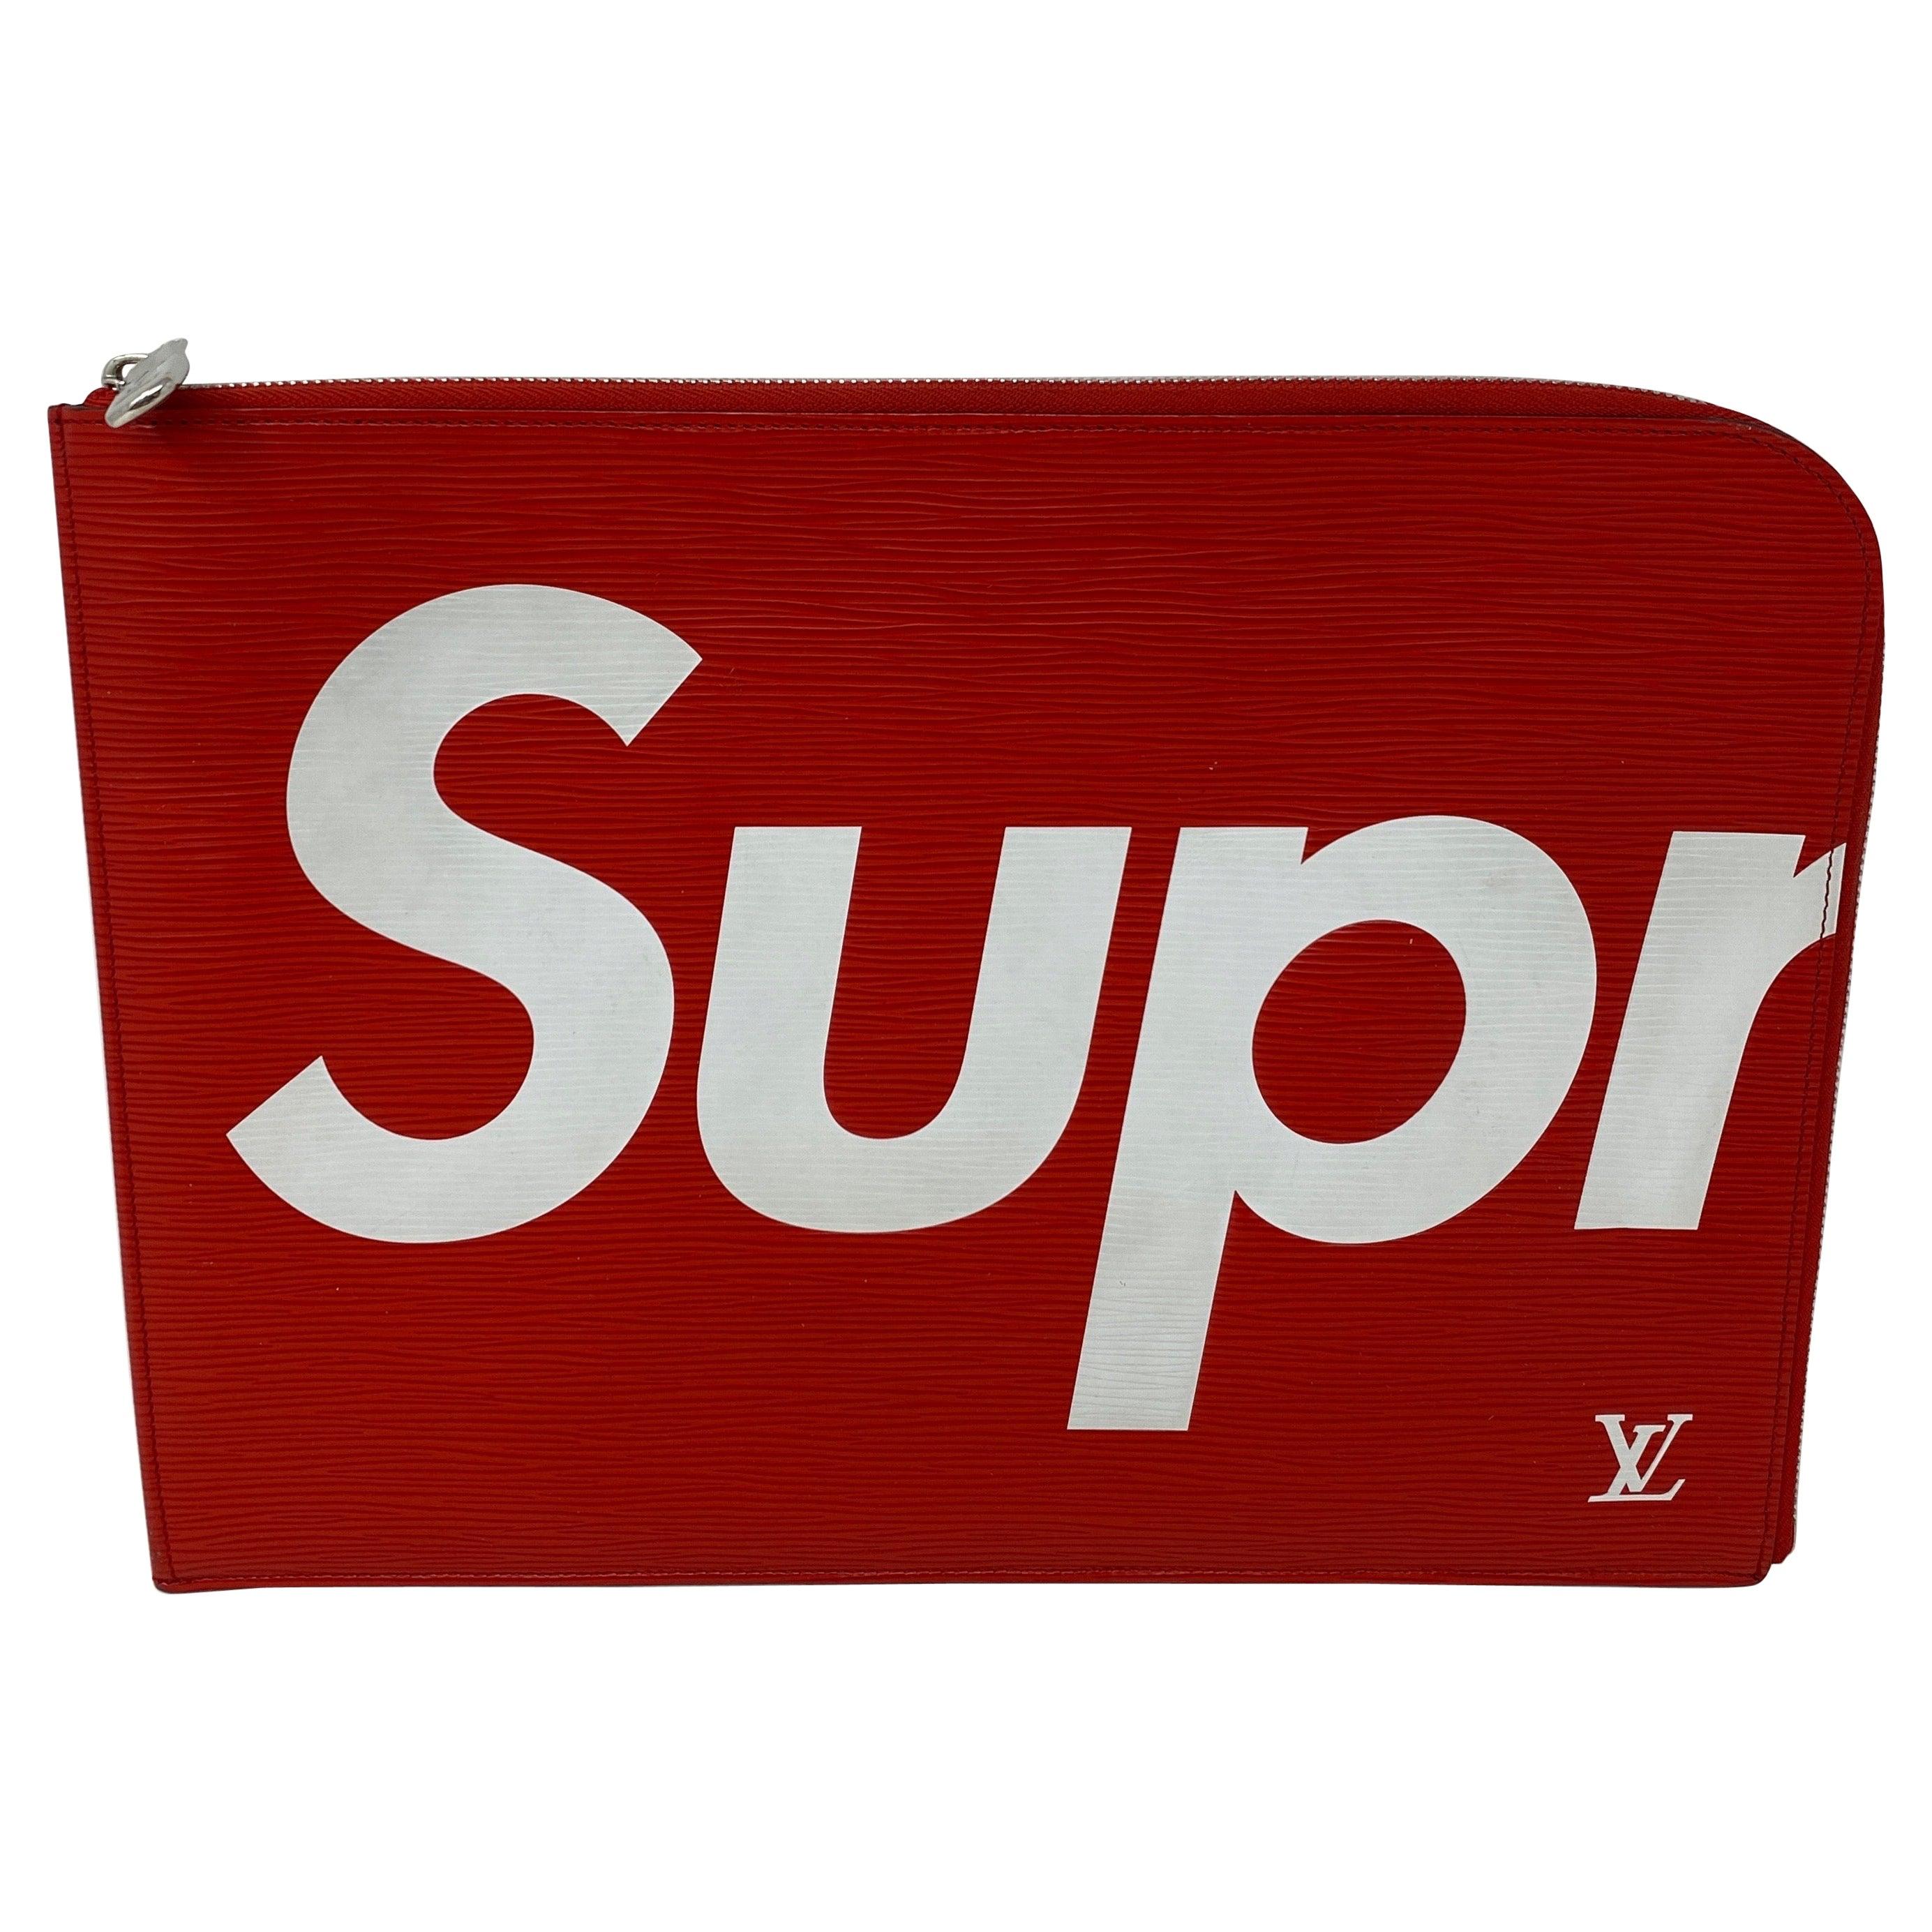 Louis Vuitton Red Supreme Clutch